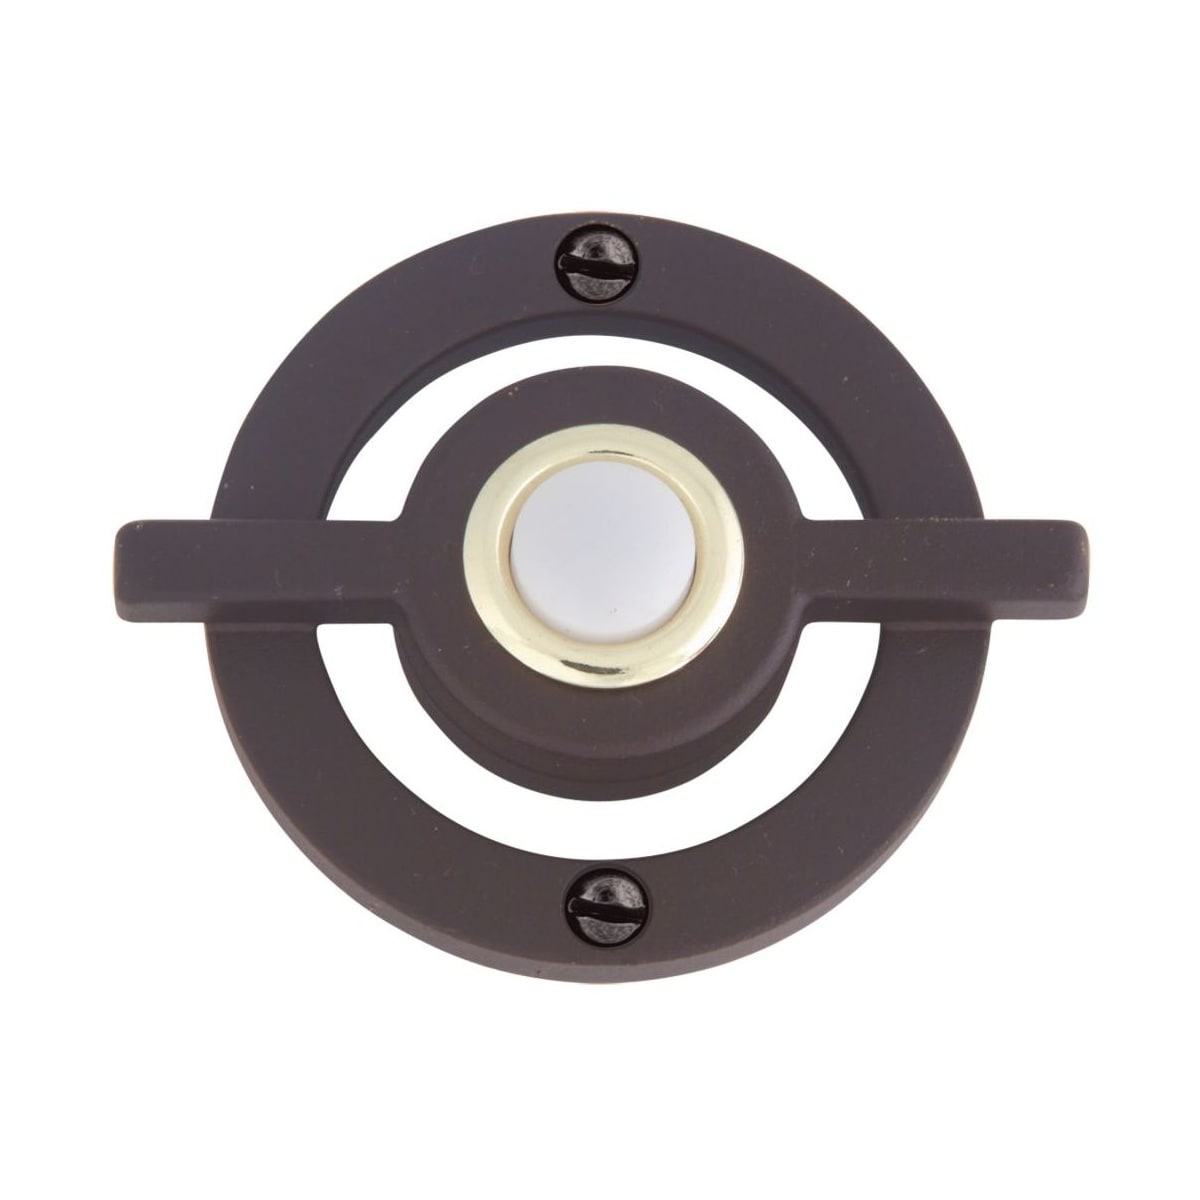 Atlas Modern Avalon 3 Inch Lighted Button Doorbell